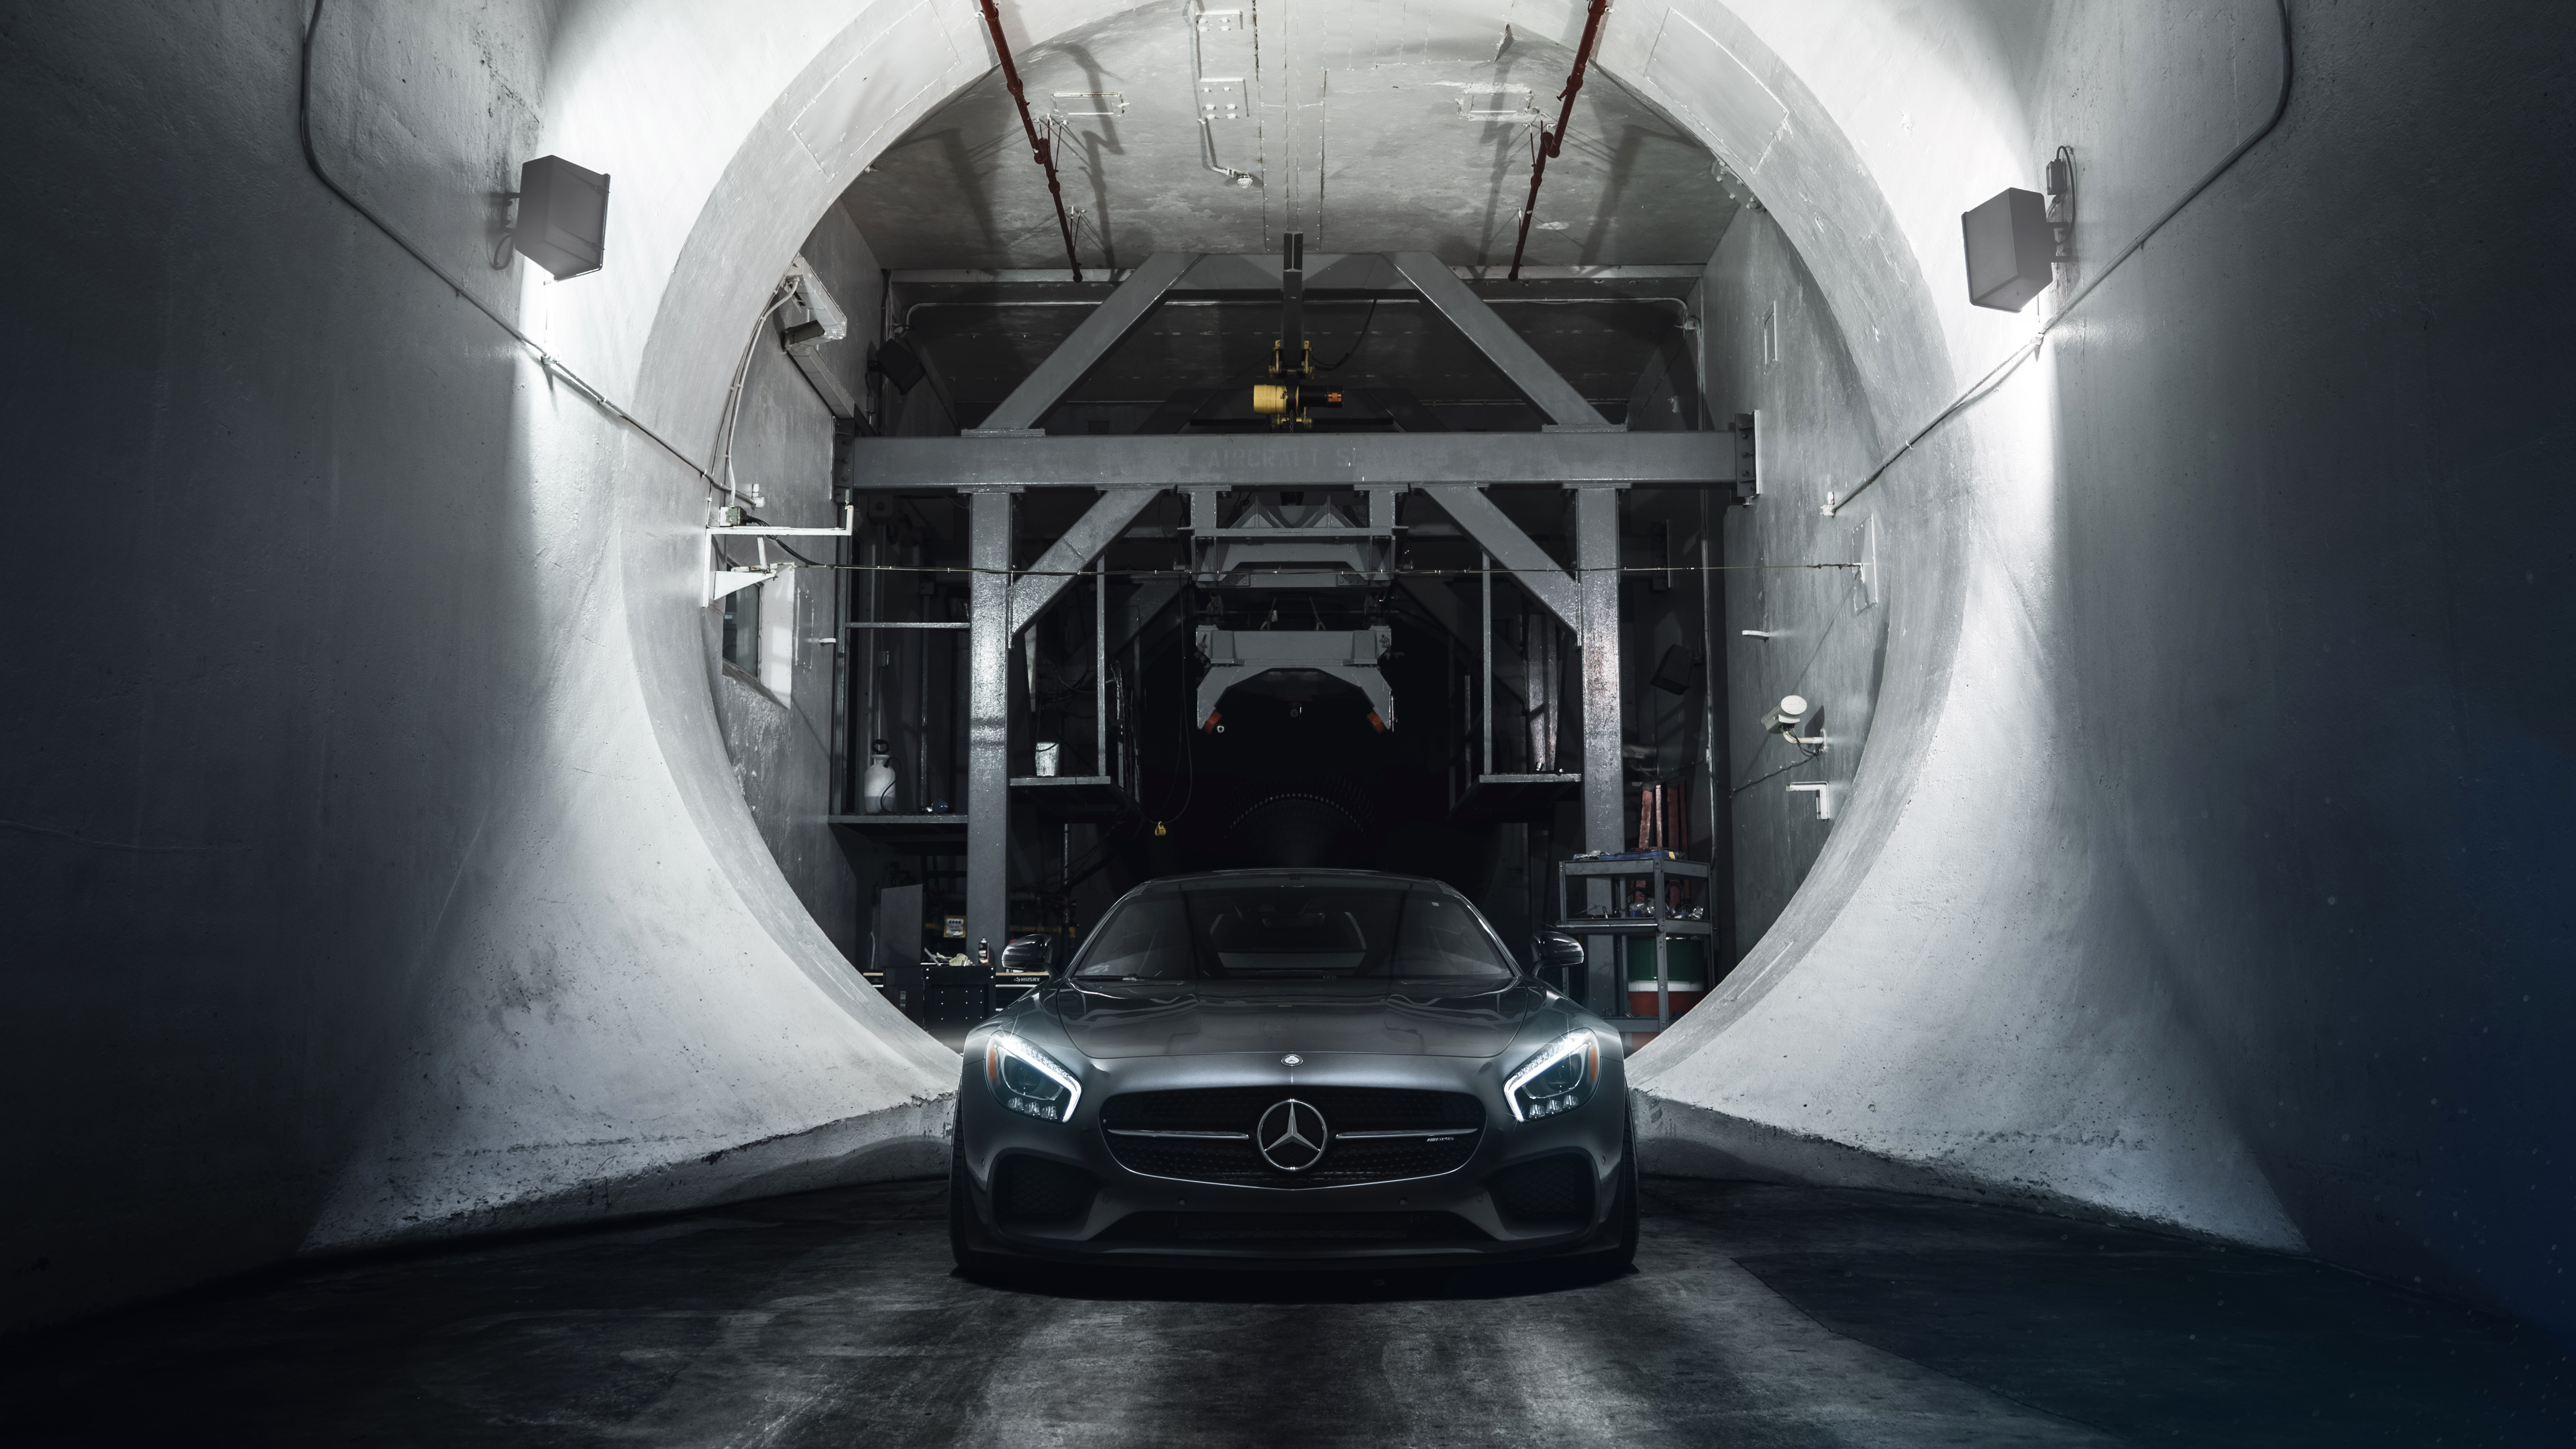 Mercedes amg gt s 2015 wallpaper hd car wallpapers - Adv1 Mercedes Benz Amg Gts